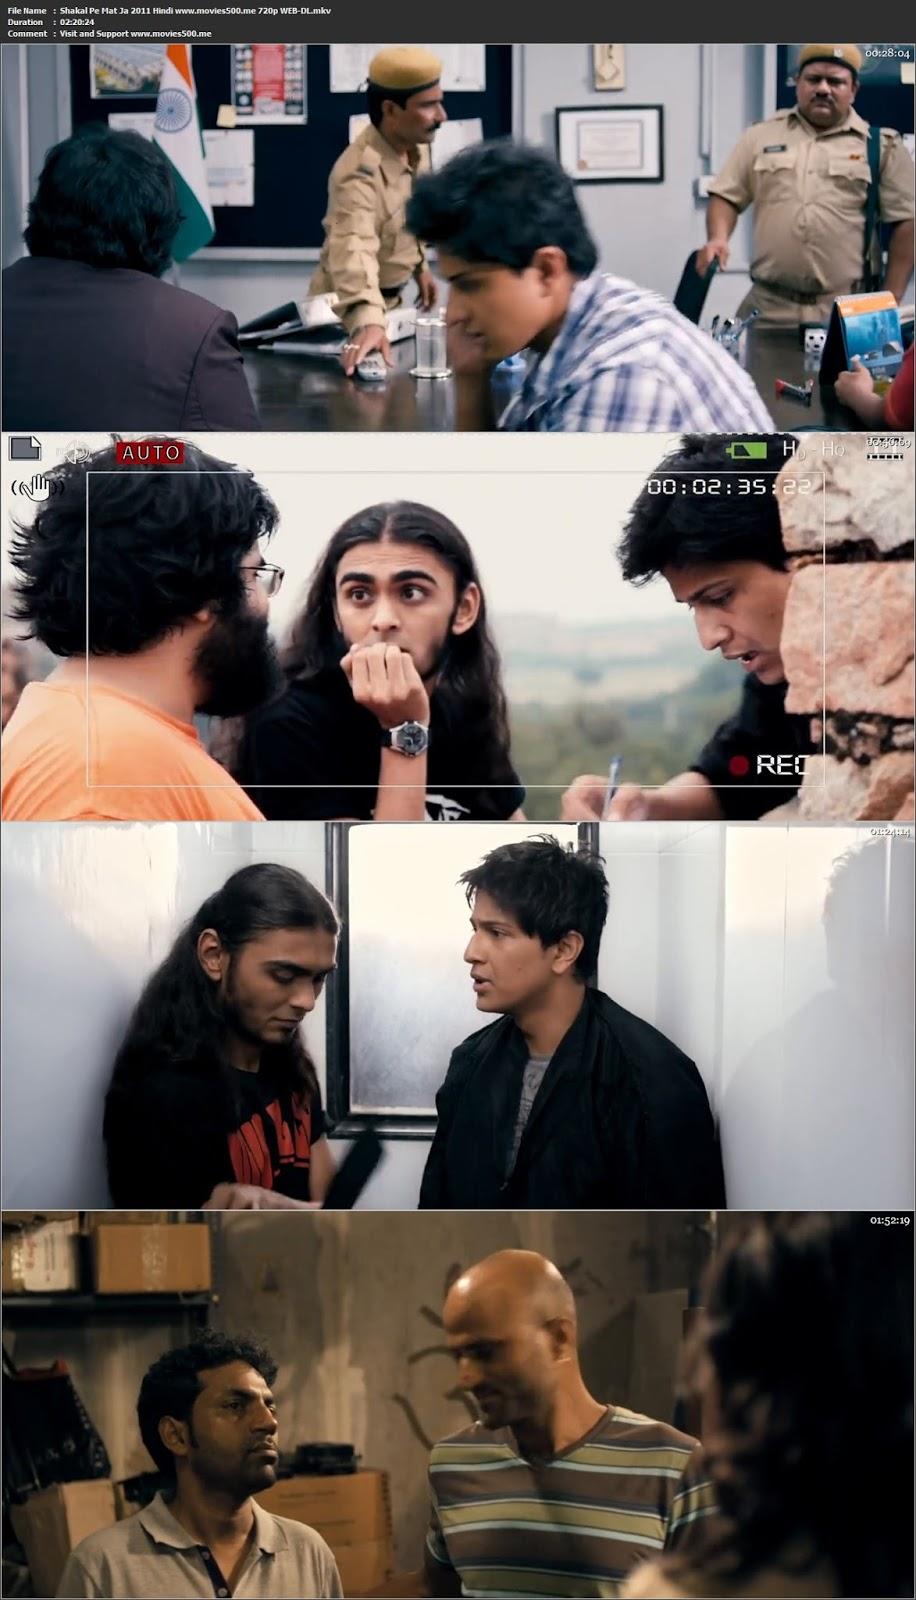 Shakal Pe Mat Ja 2011 Hindi Full Movie WEB DL 720p at movies500.xyz